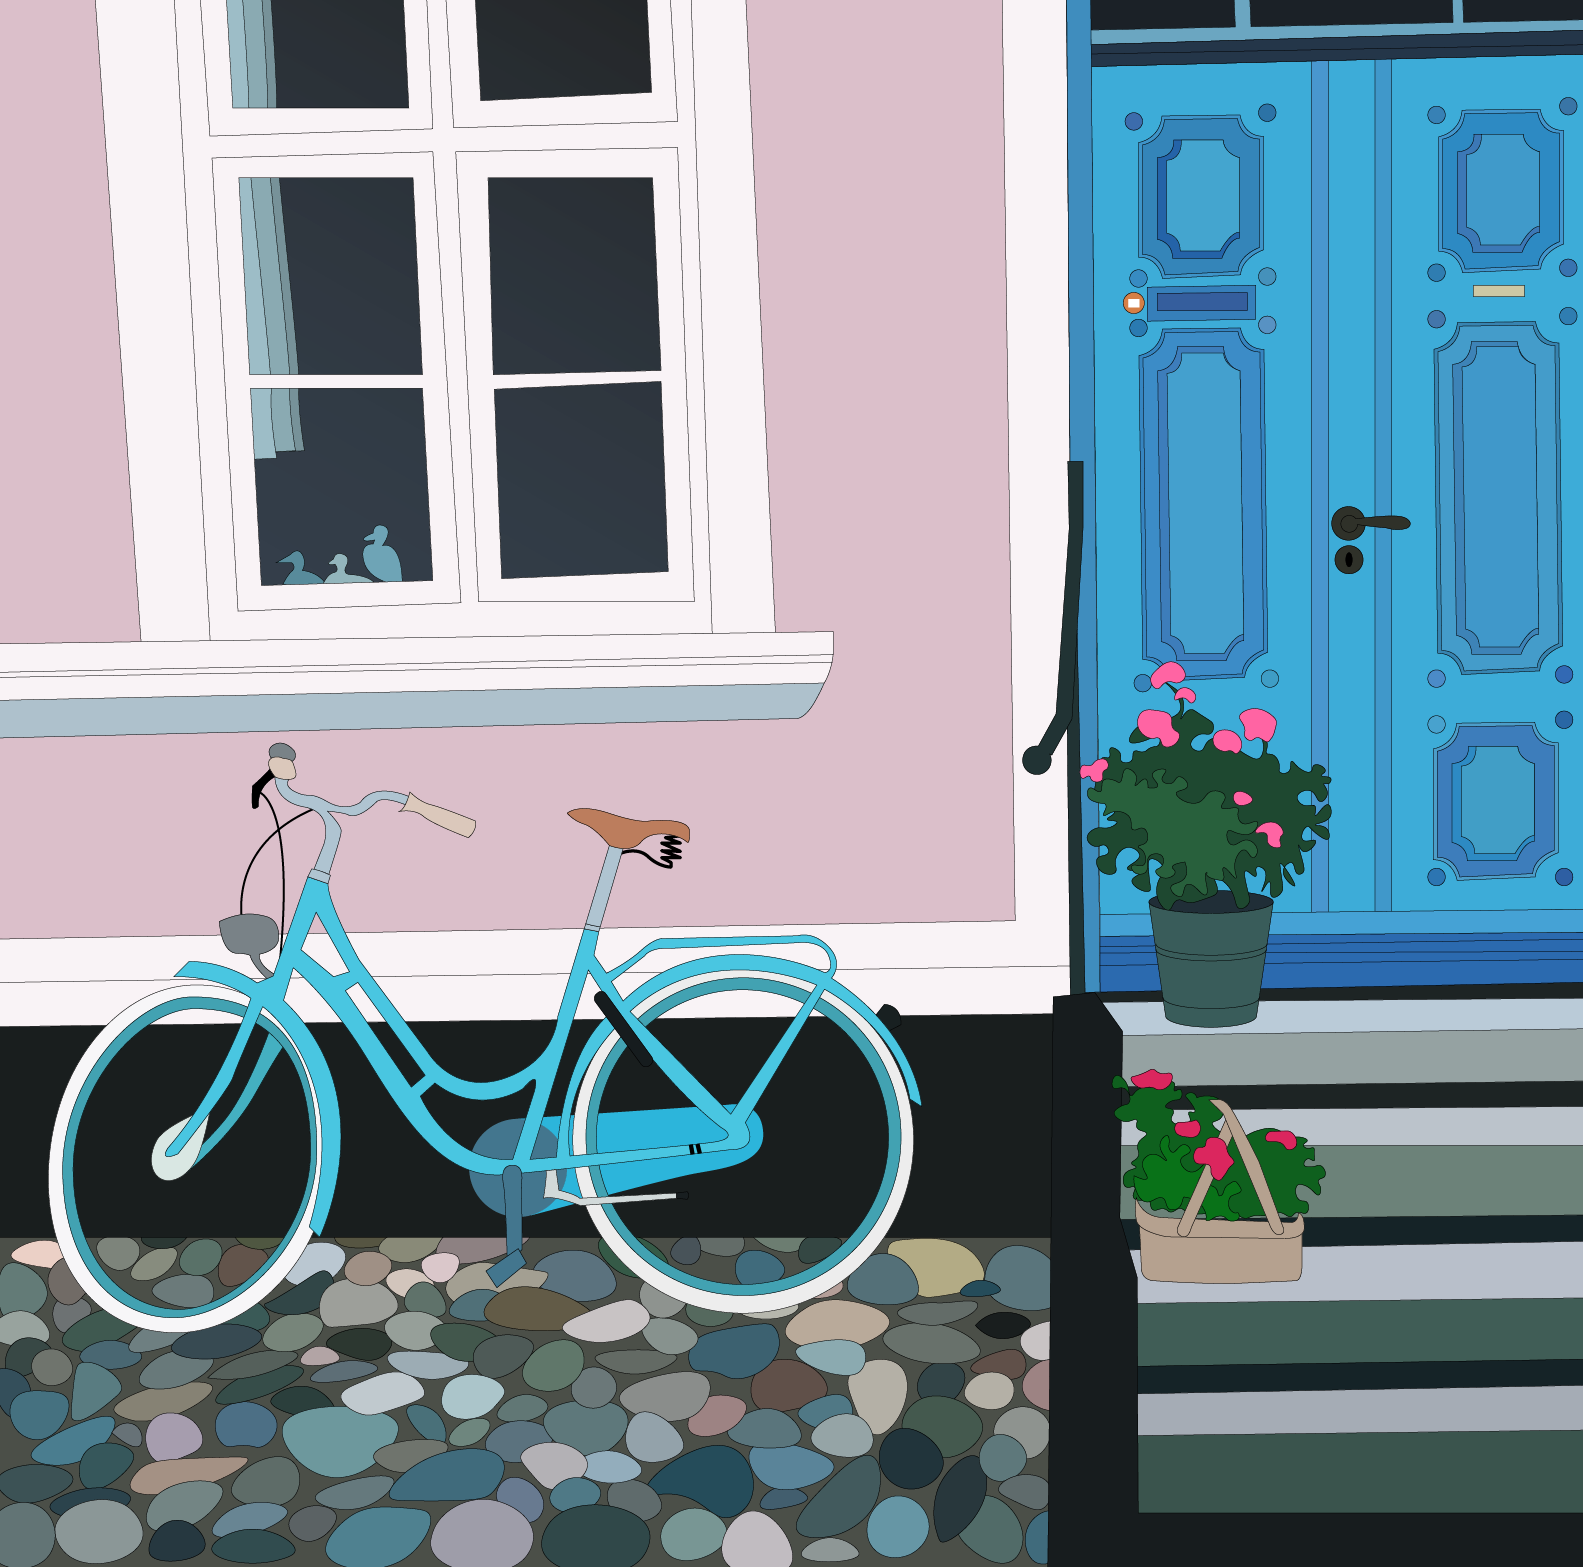 En illustration af en husfacade med en cykel foran